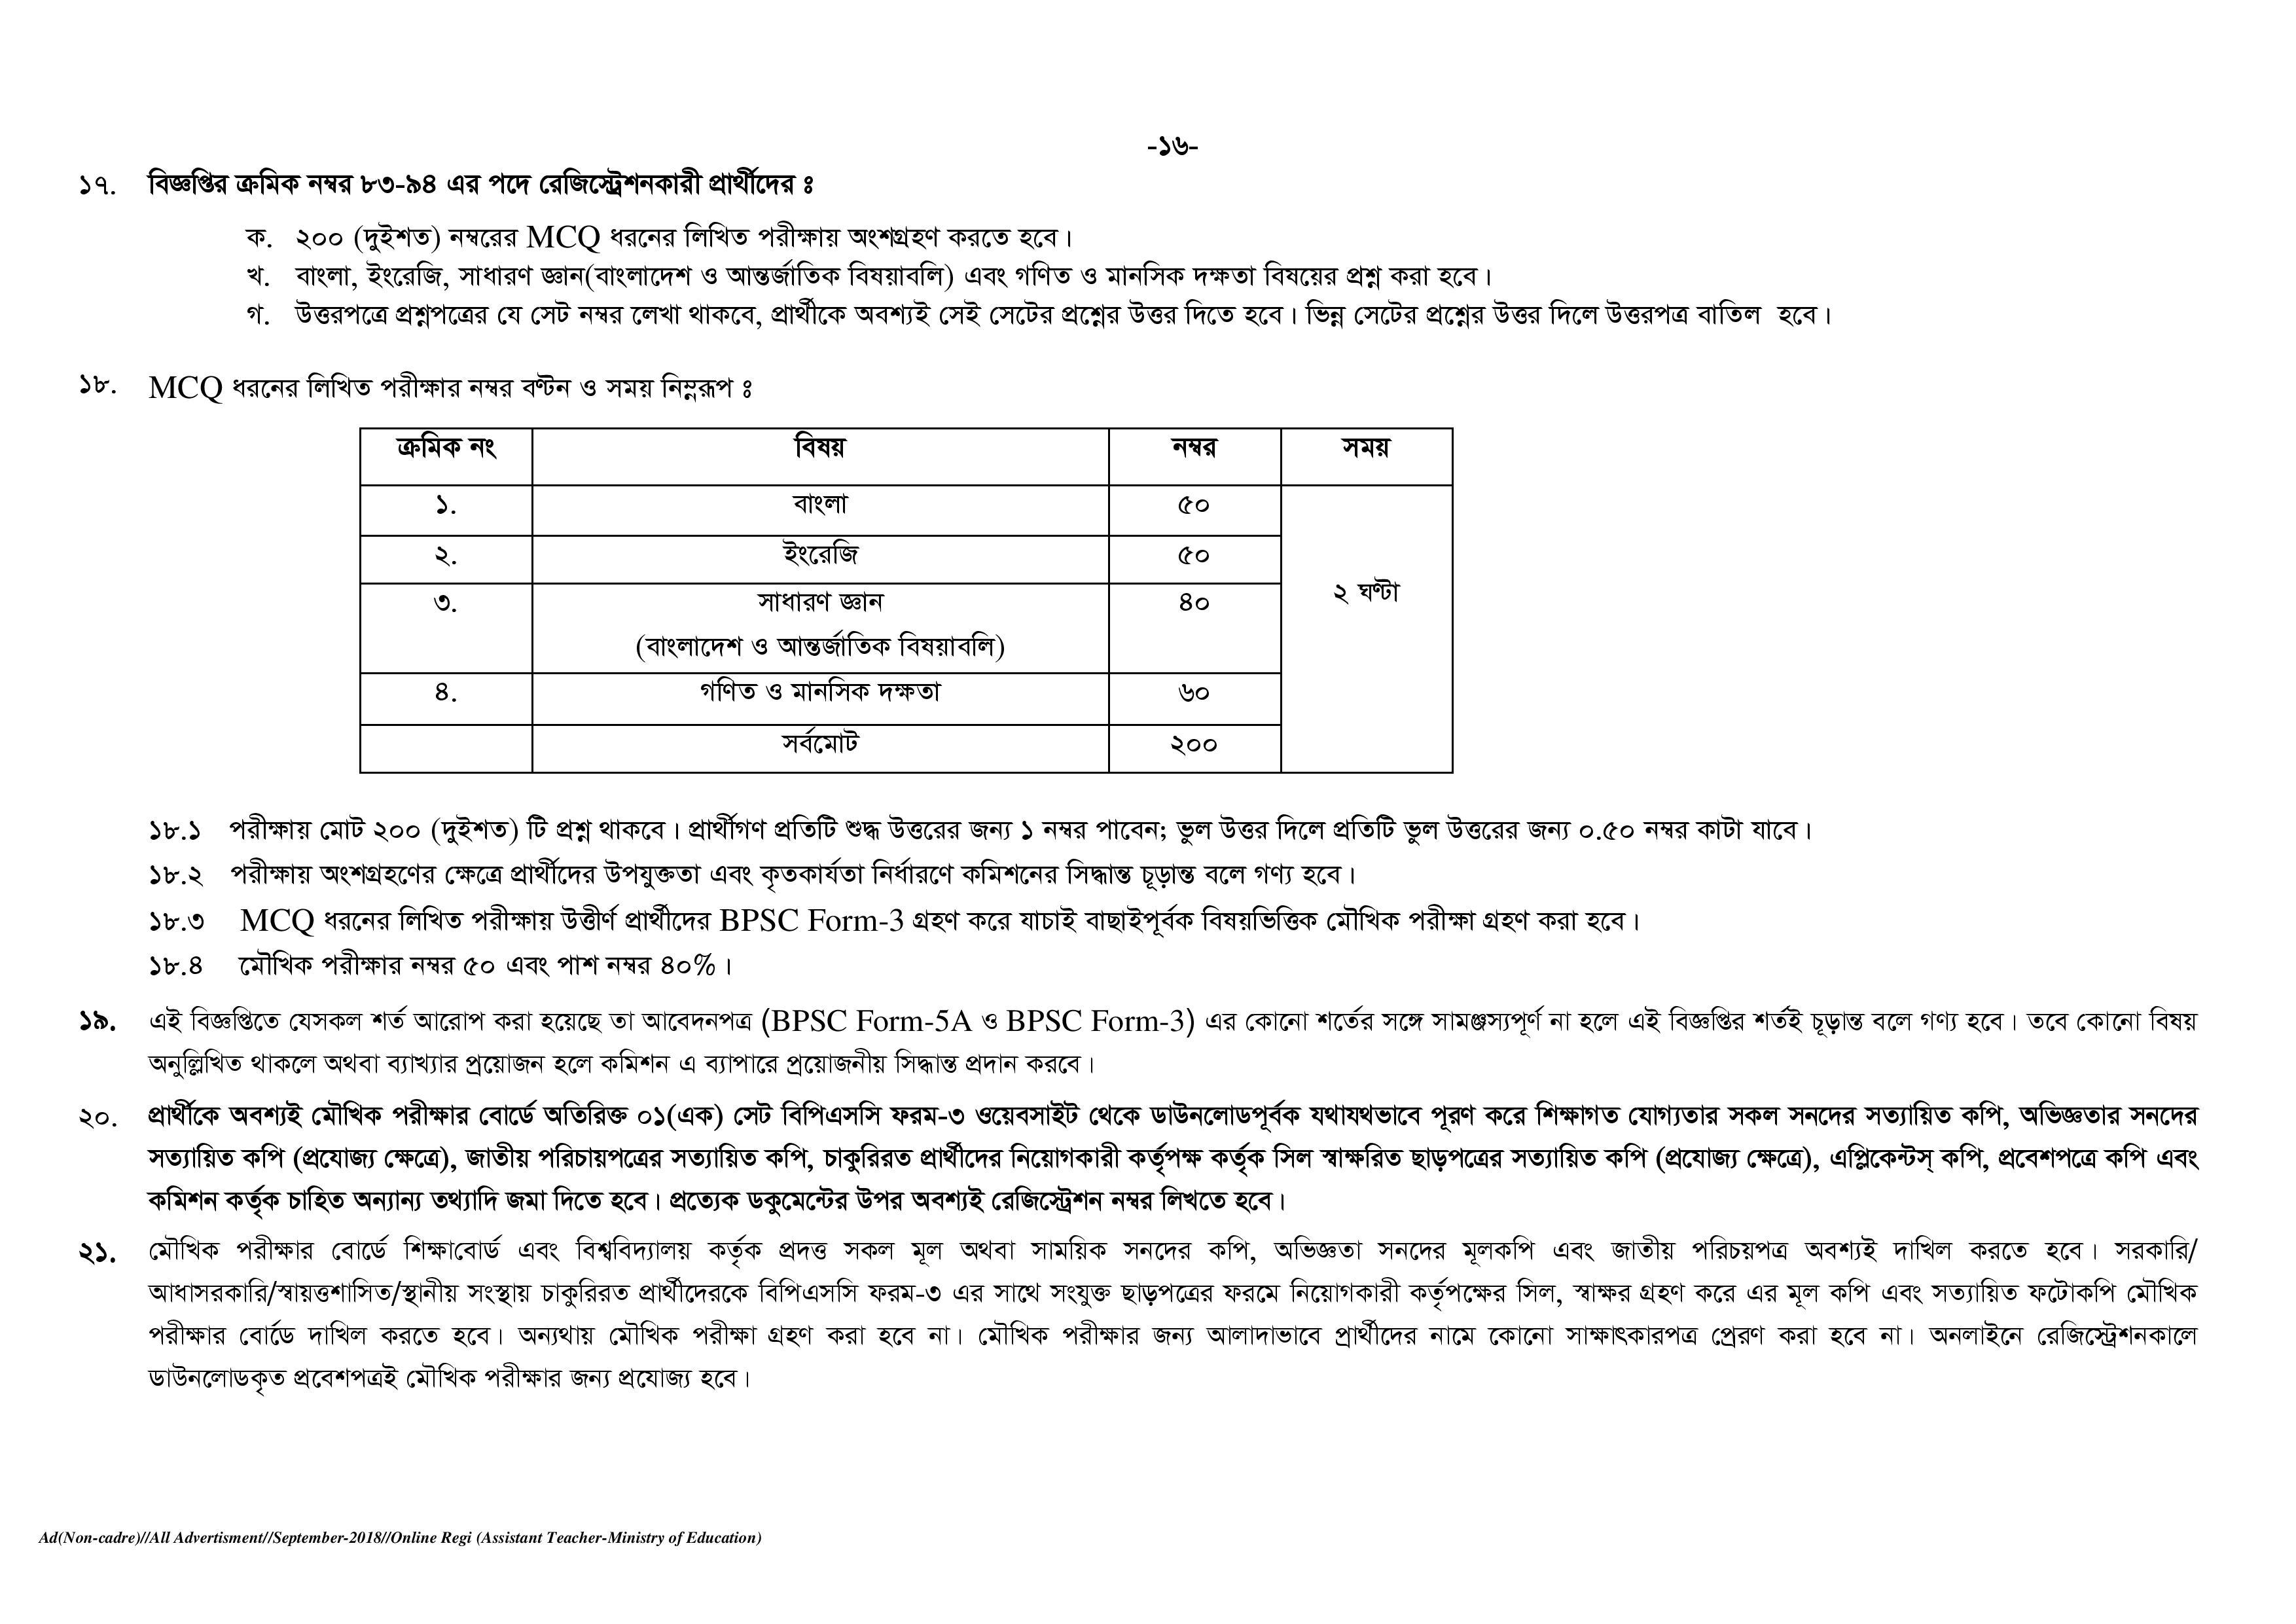 BPSC Assistant Teacher Job Circular page 016 — imgbb com